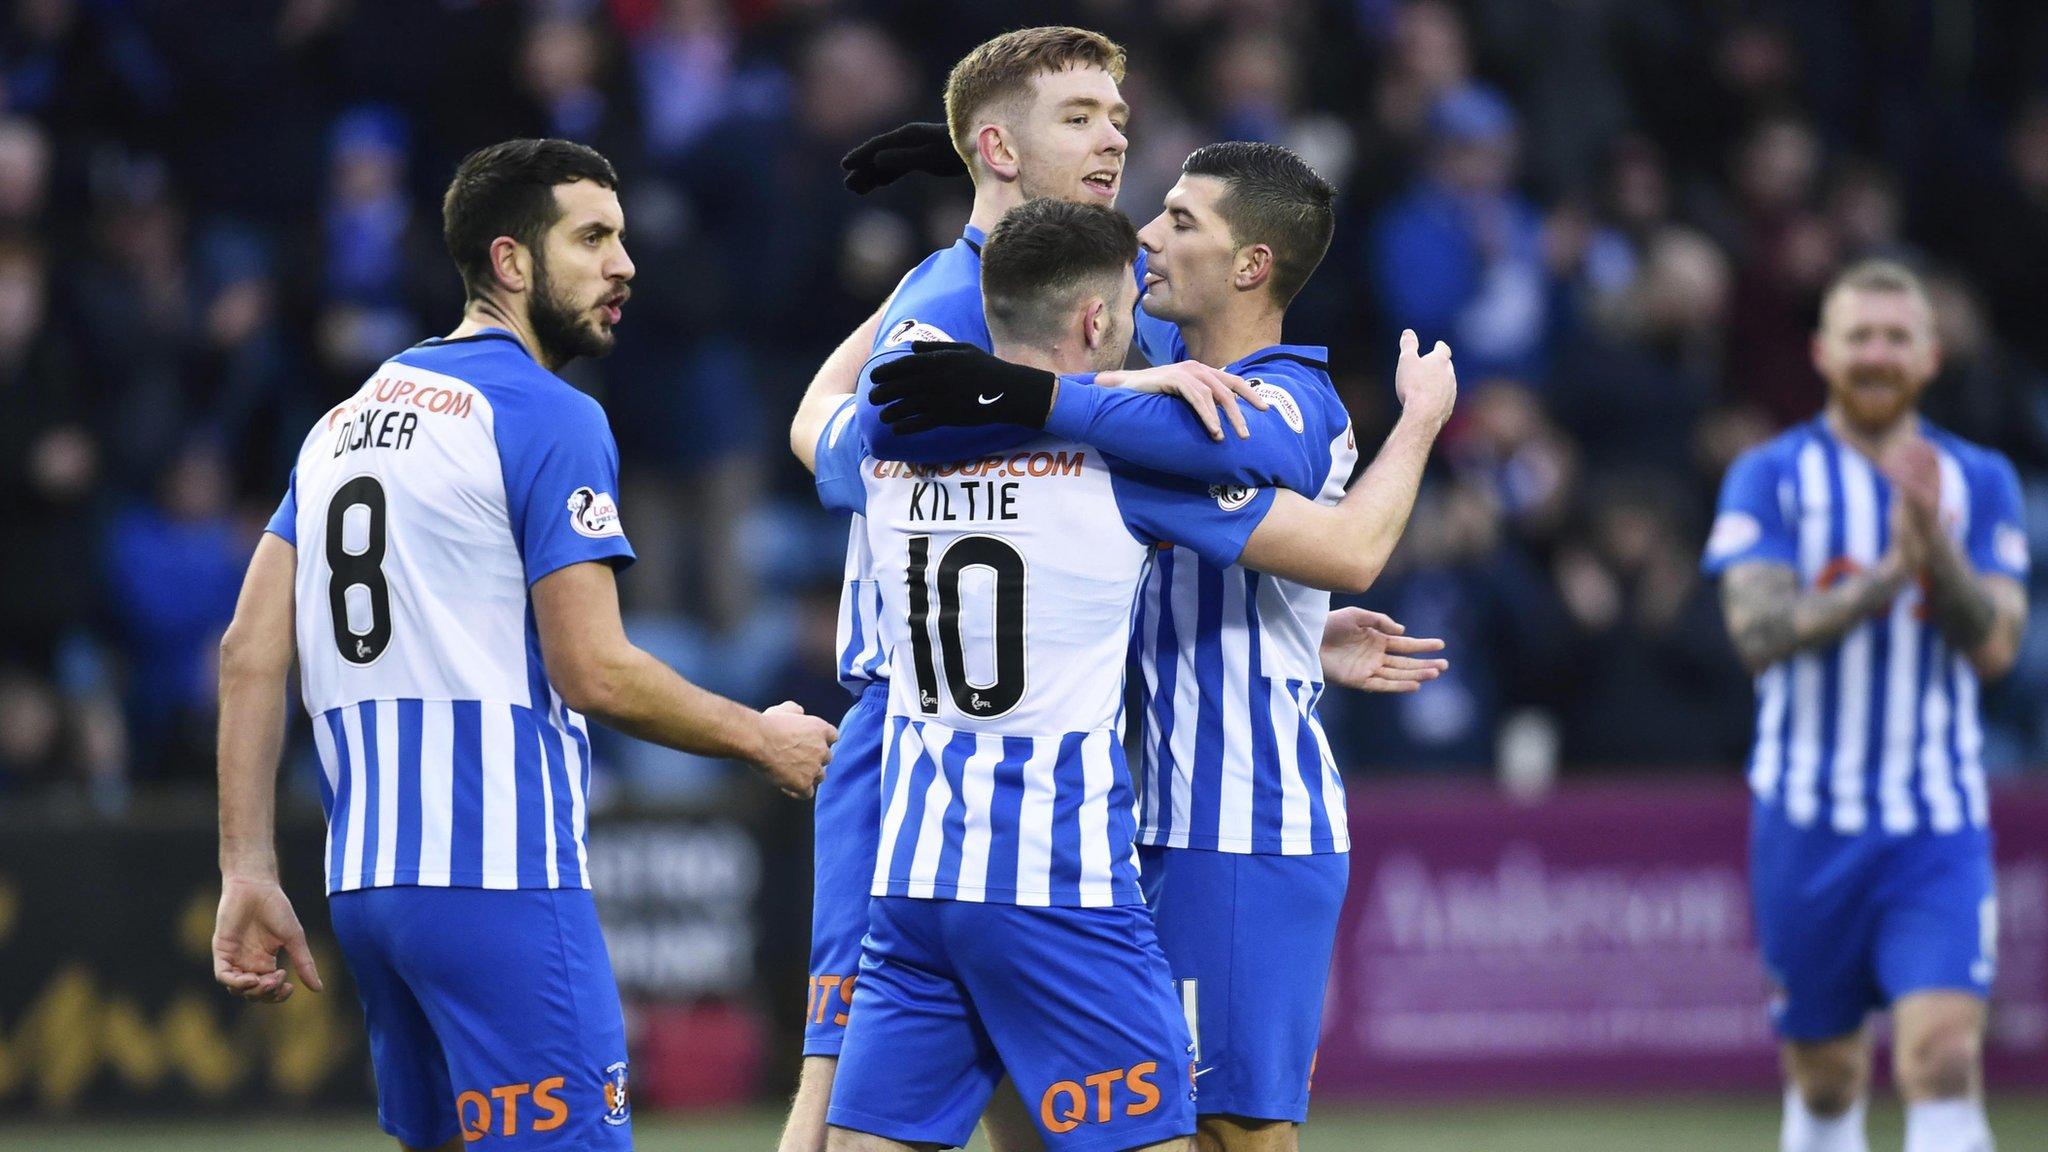 Kilmarnock 2-0 Forfar Athletic: Findlay & Burke fire hosts in fifth round